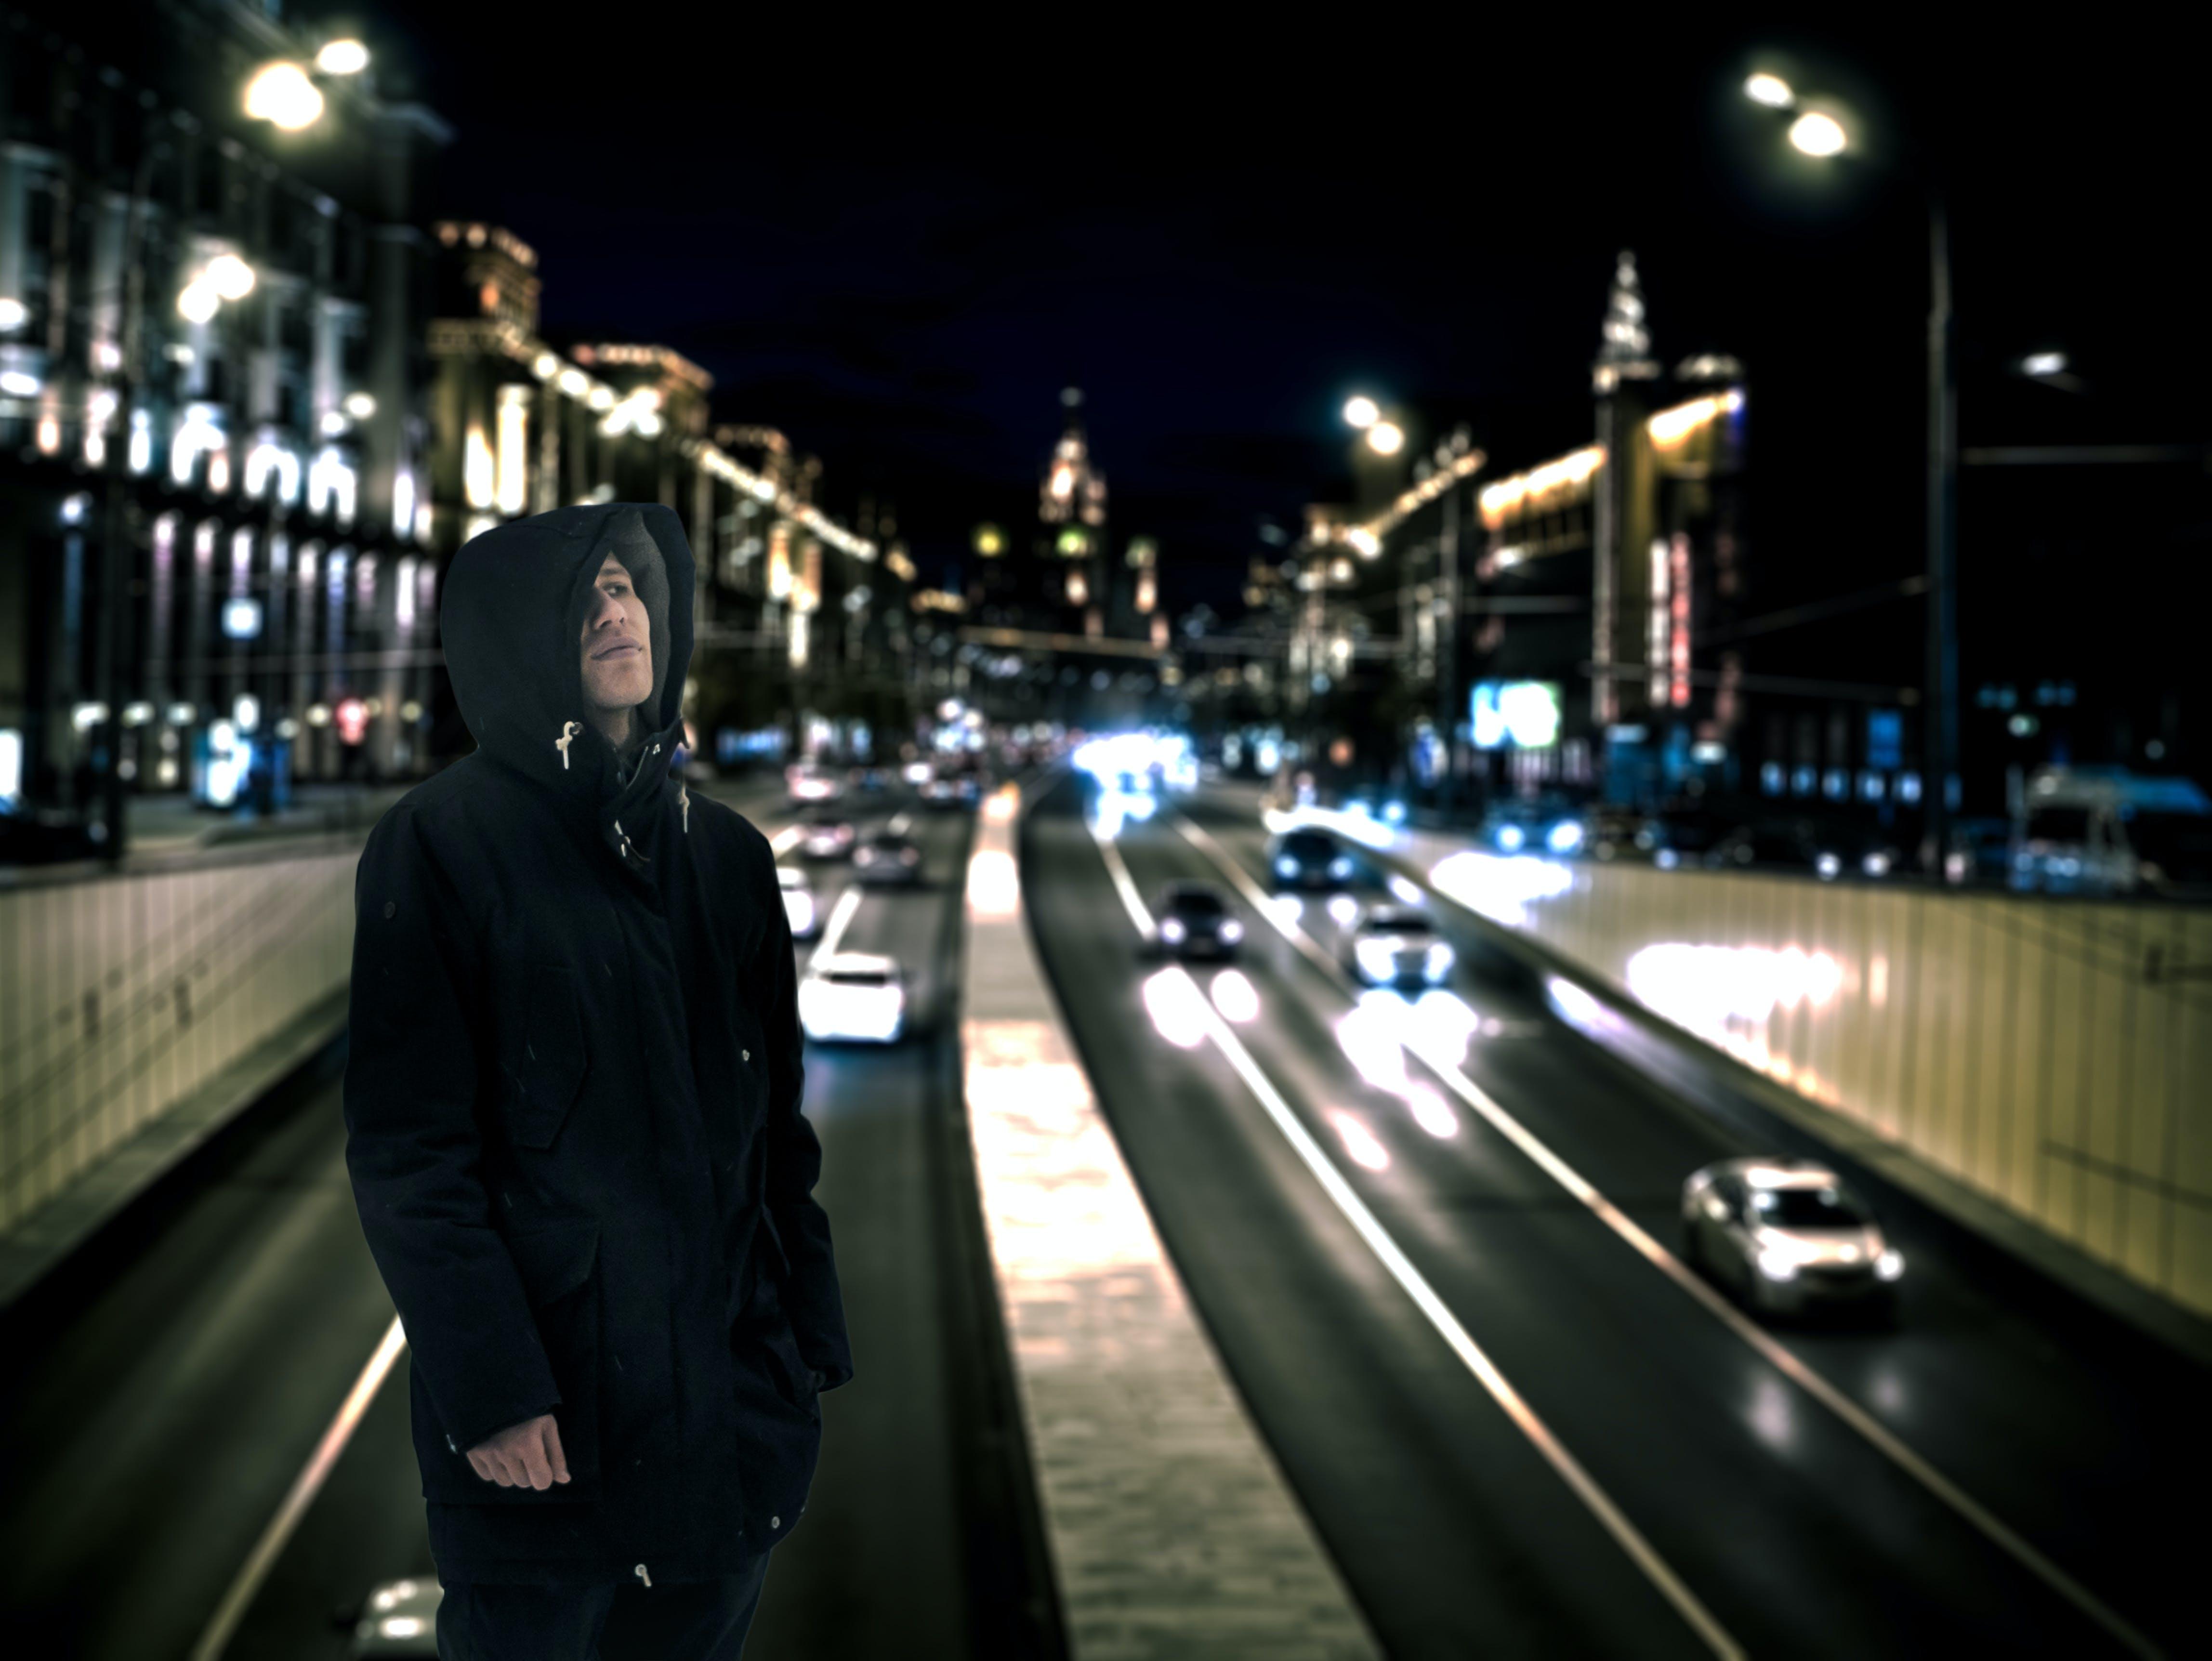 Man Wearing Black Hoodie With Road Background